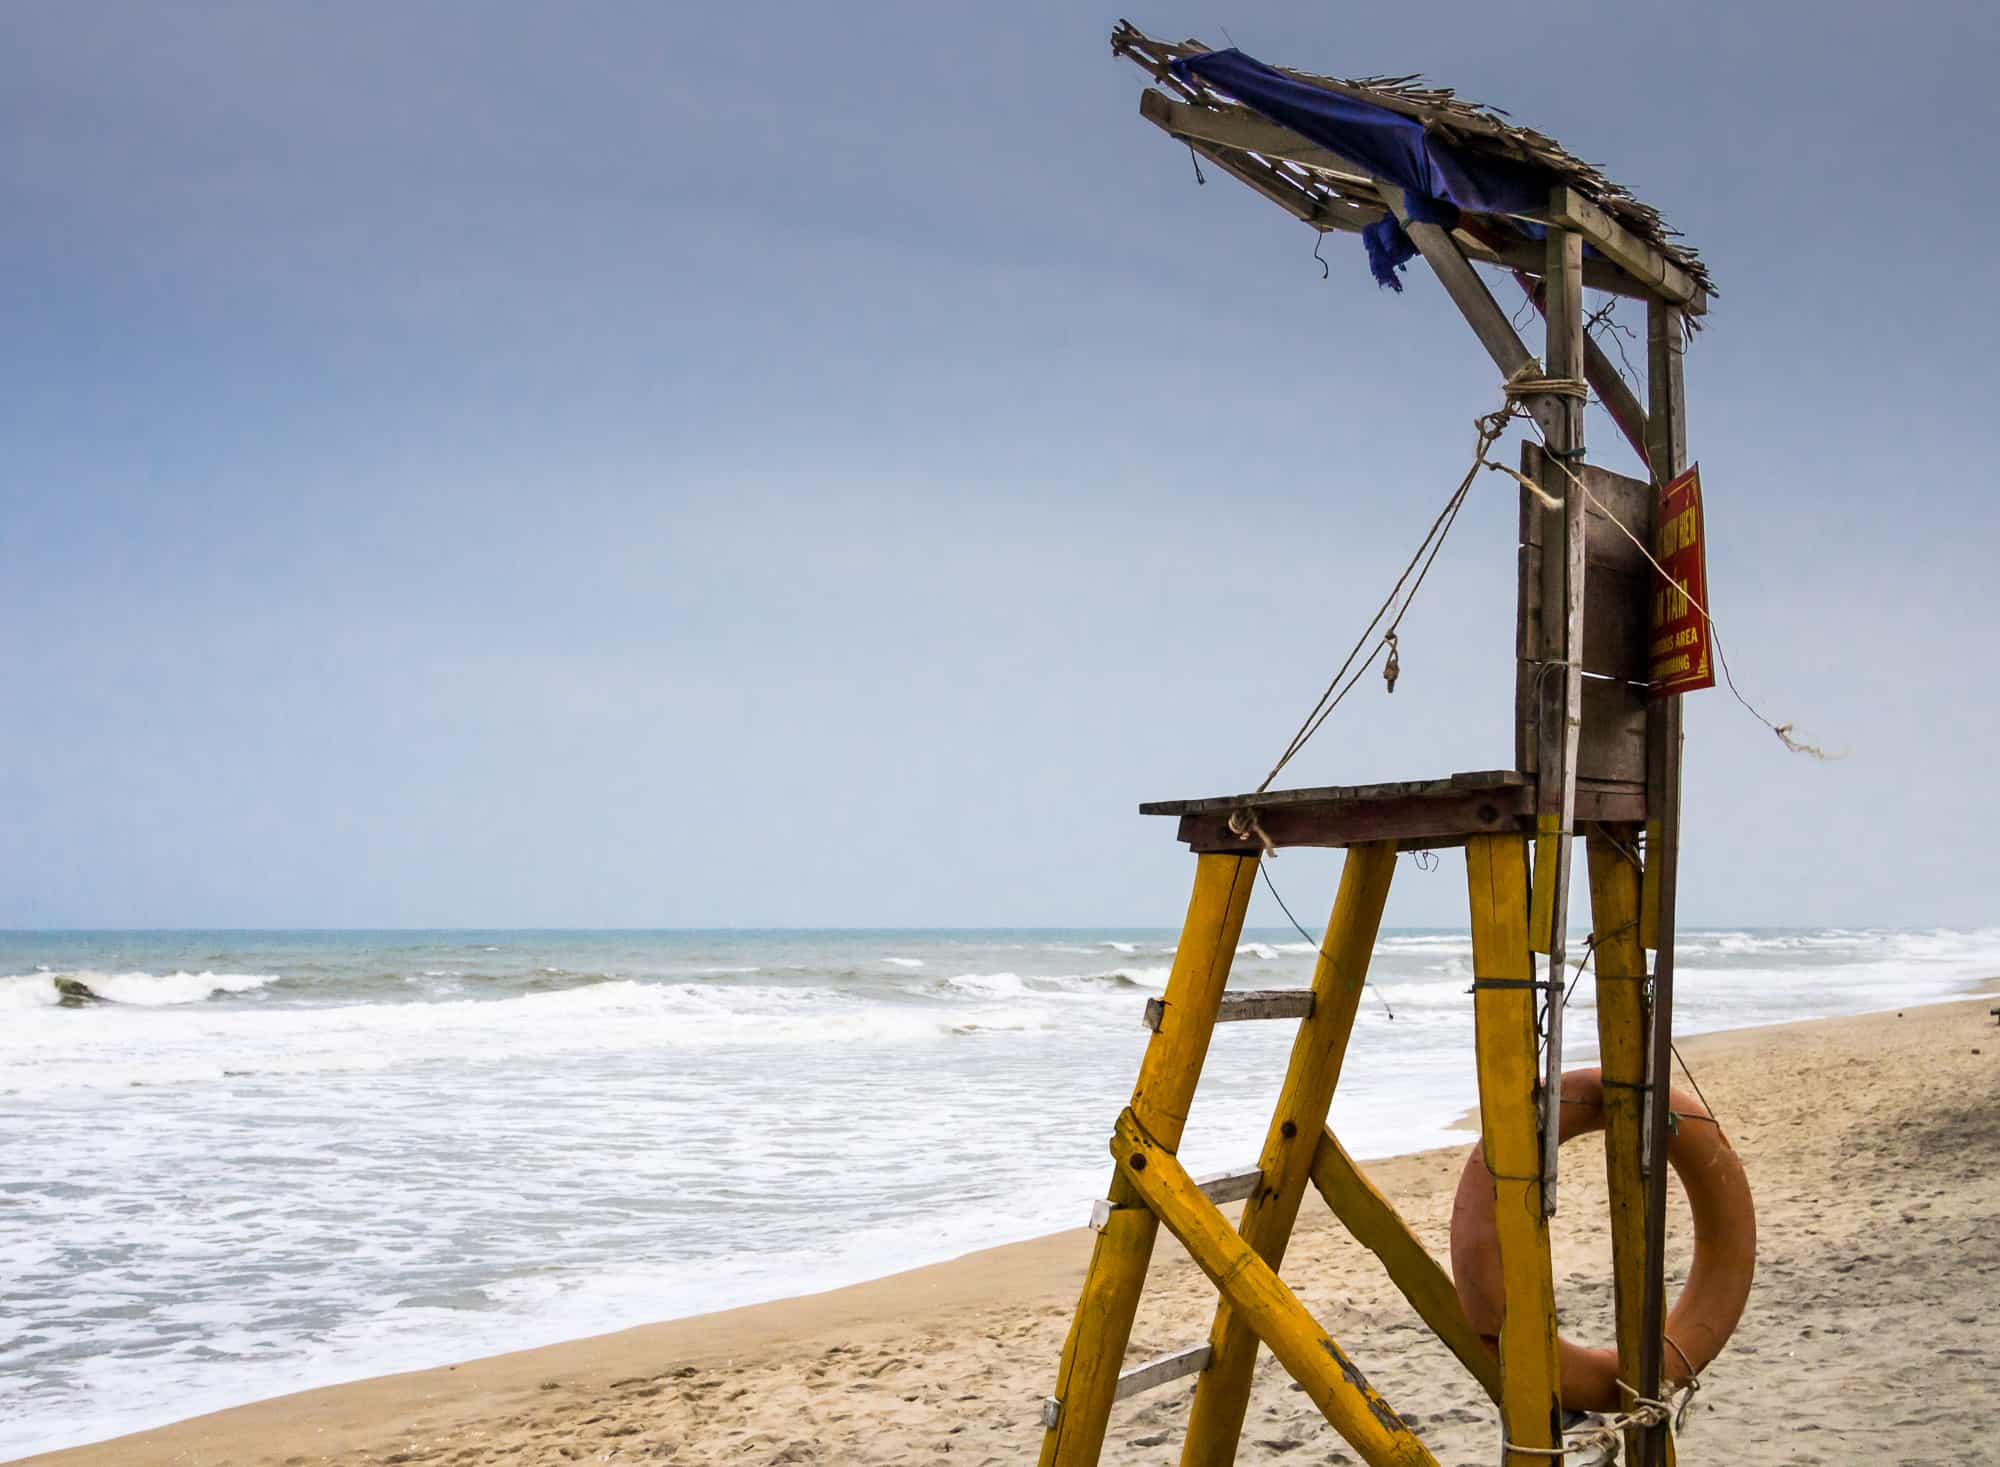 lifeguard chair on the beach in hoi an